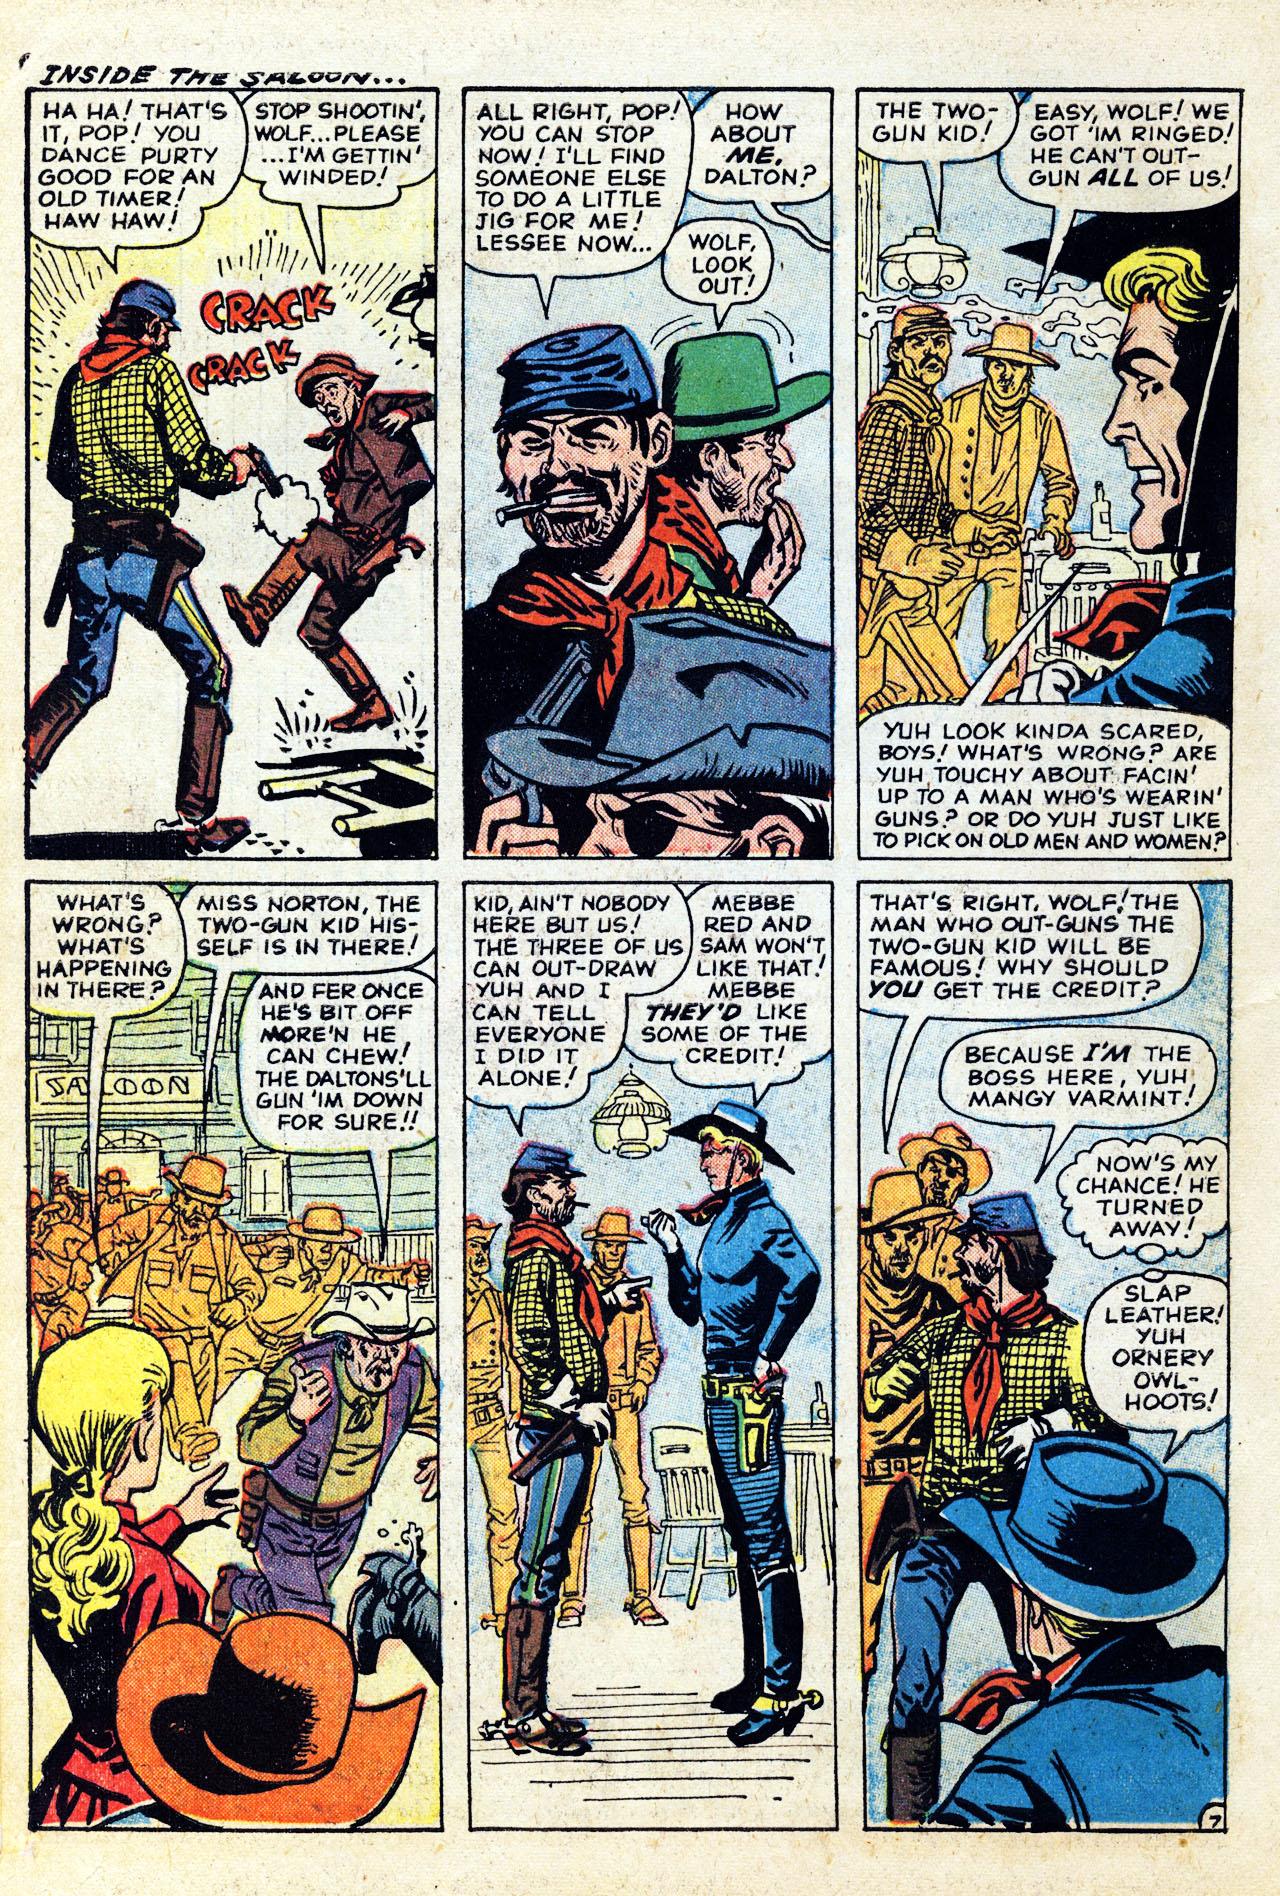 Read online Two-Gun Kid comic -  Issue #43 - 10